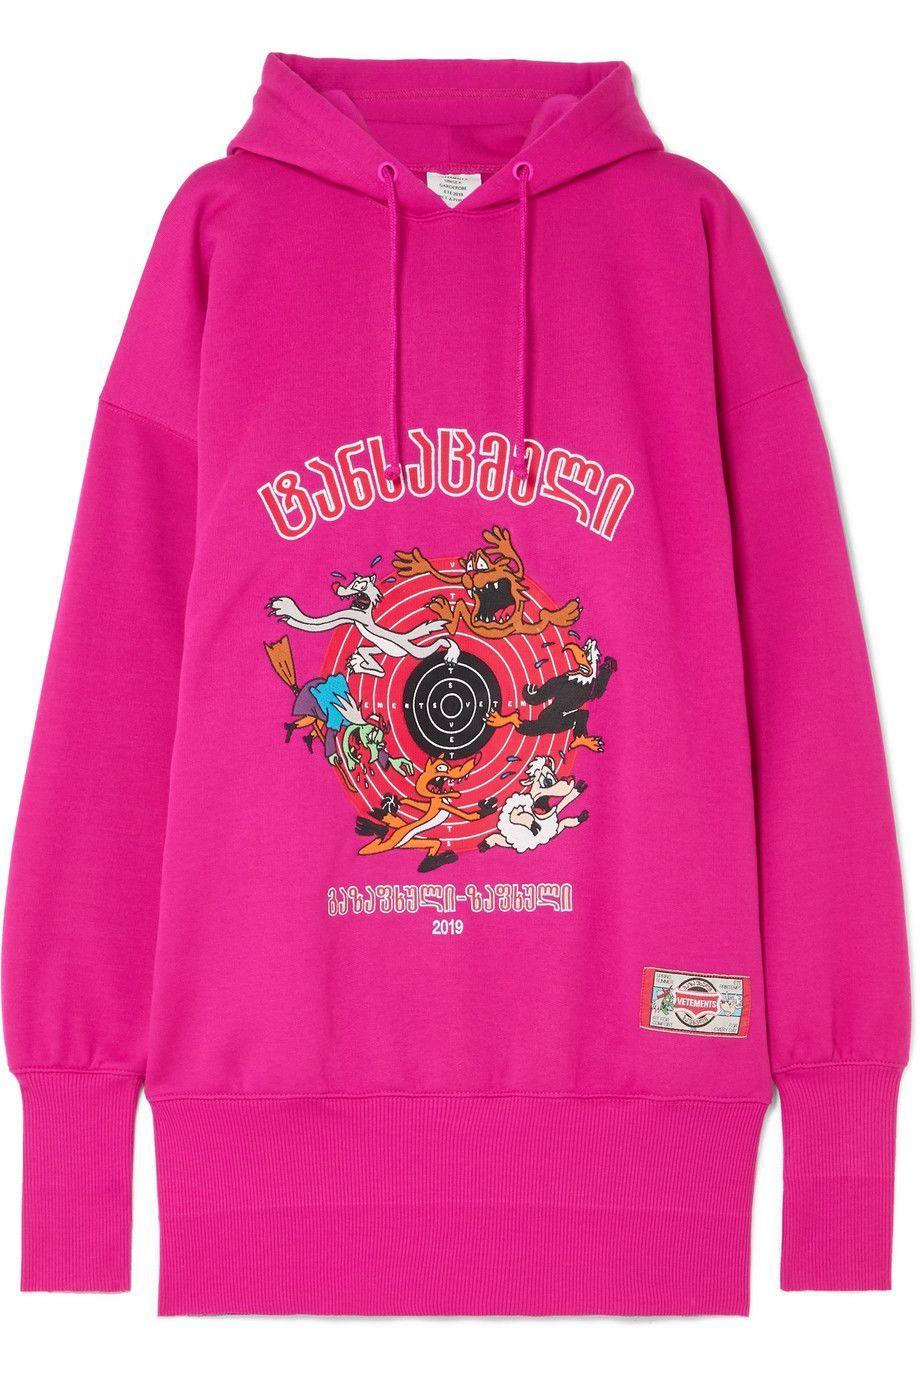 6 Sweatshirt Ini Bikin Penampilanmu Sekeren Ariana Grande